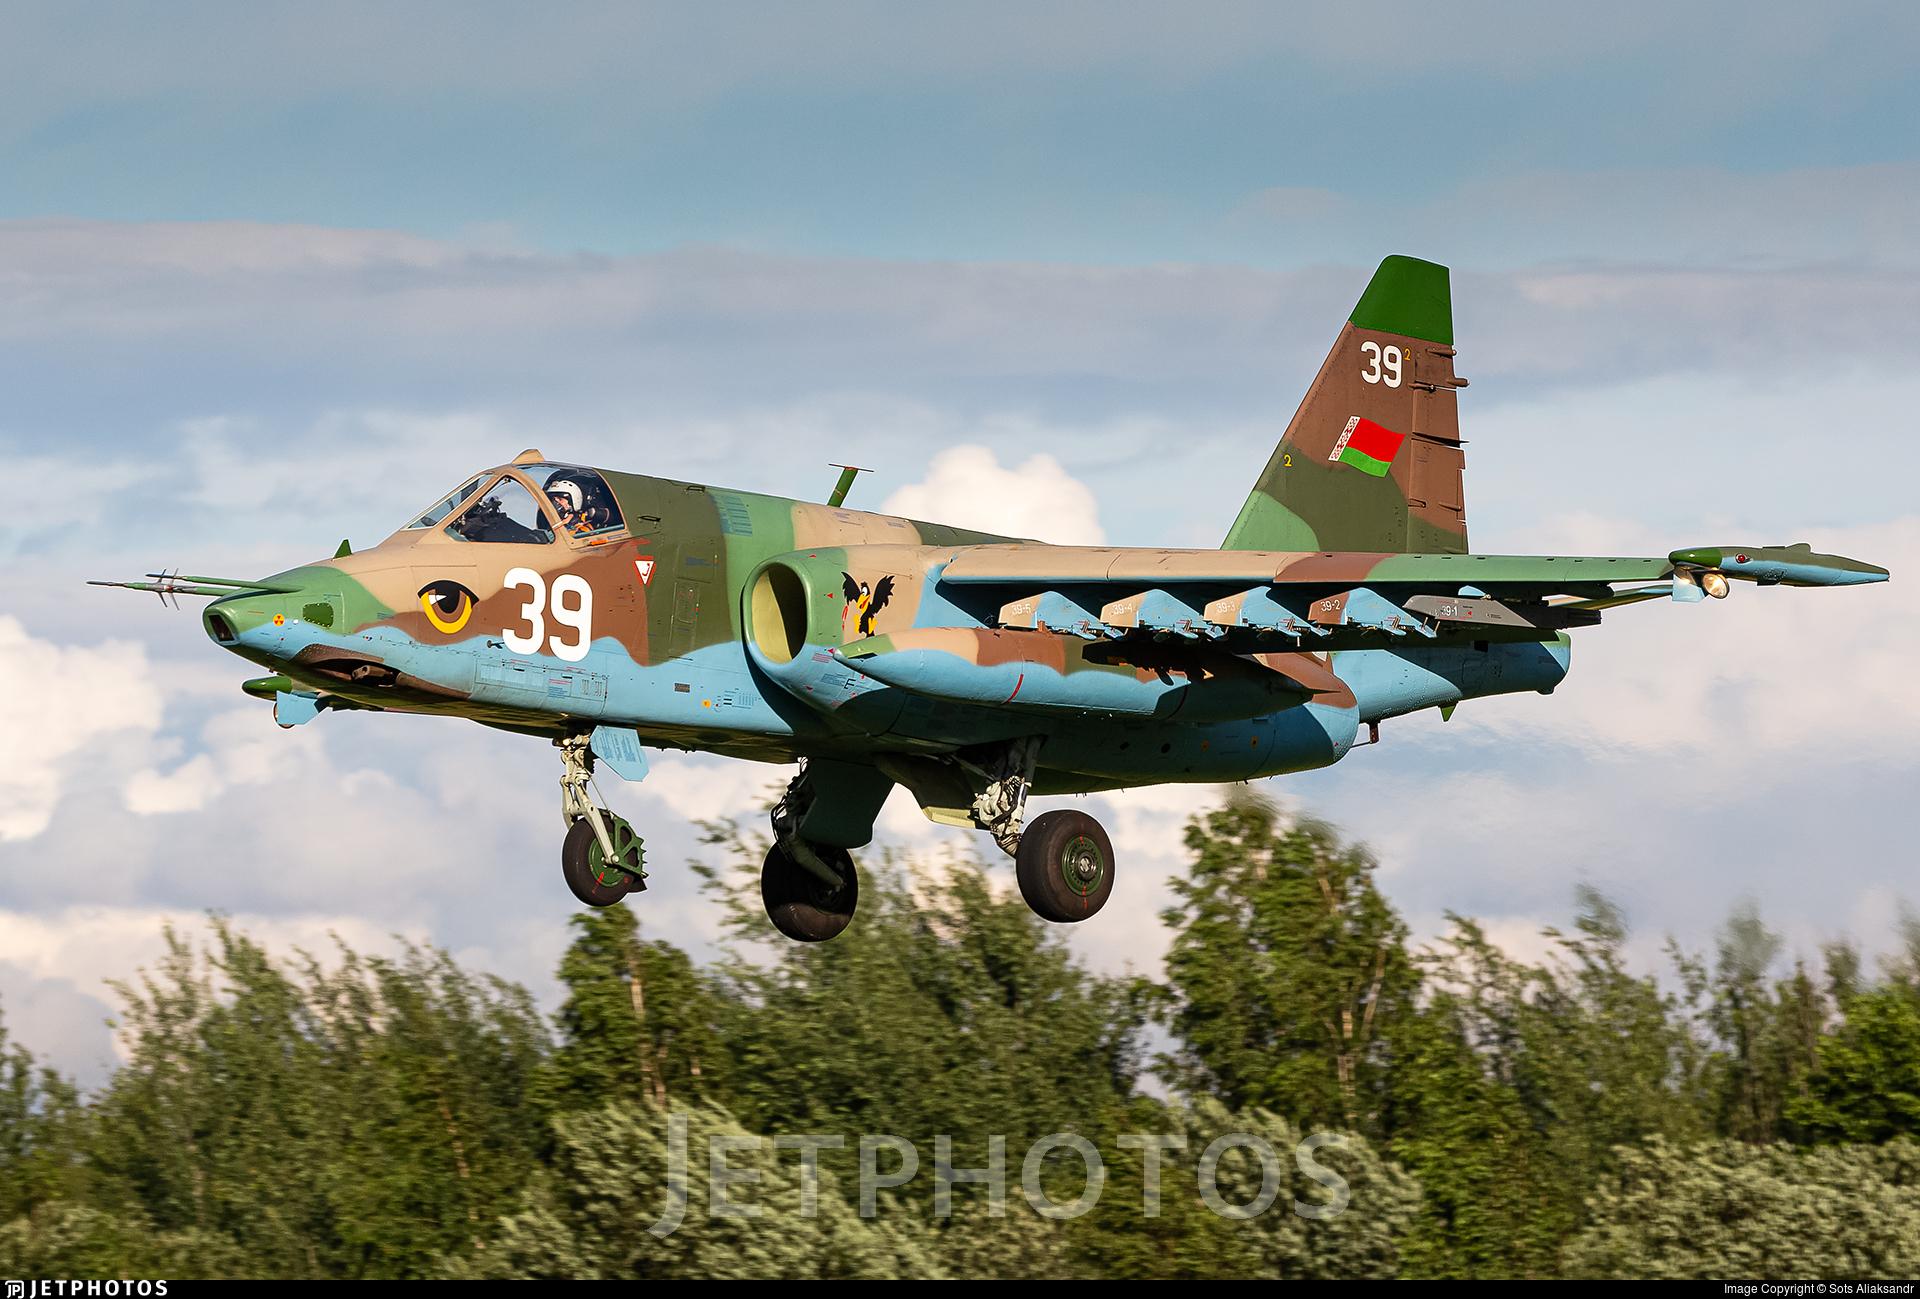 39 - Sukhoi Su-25 Frogfoot - Belarus - Air Force